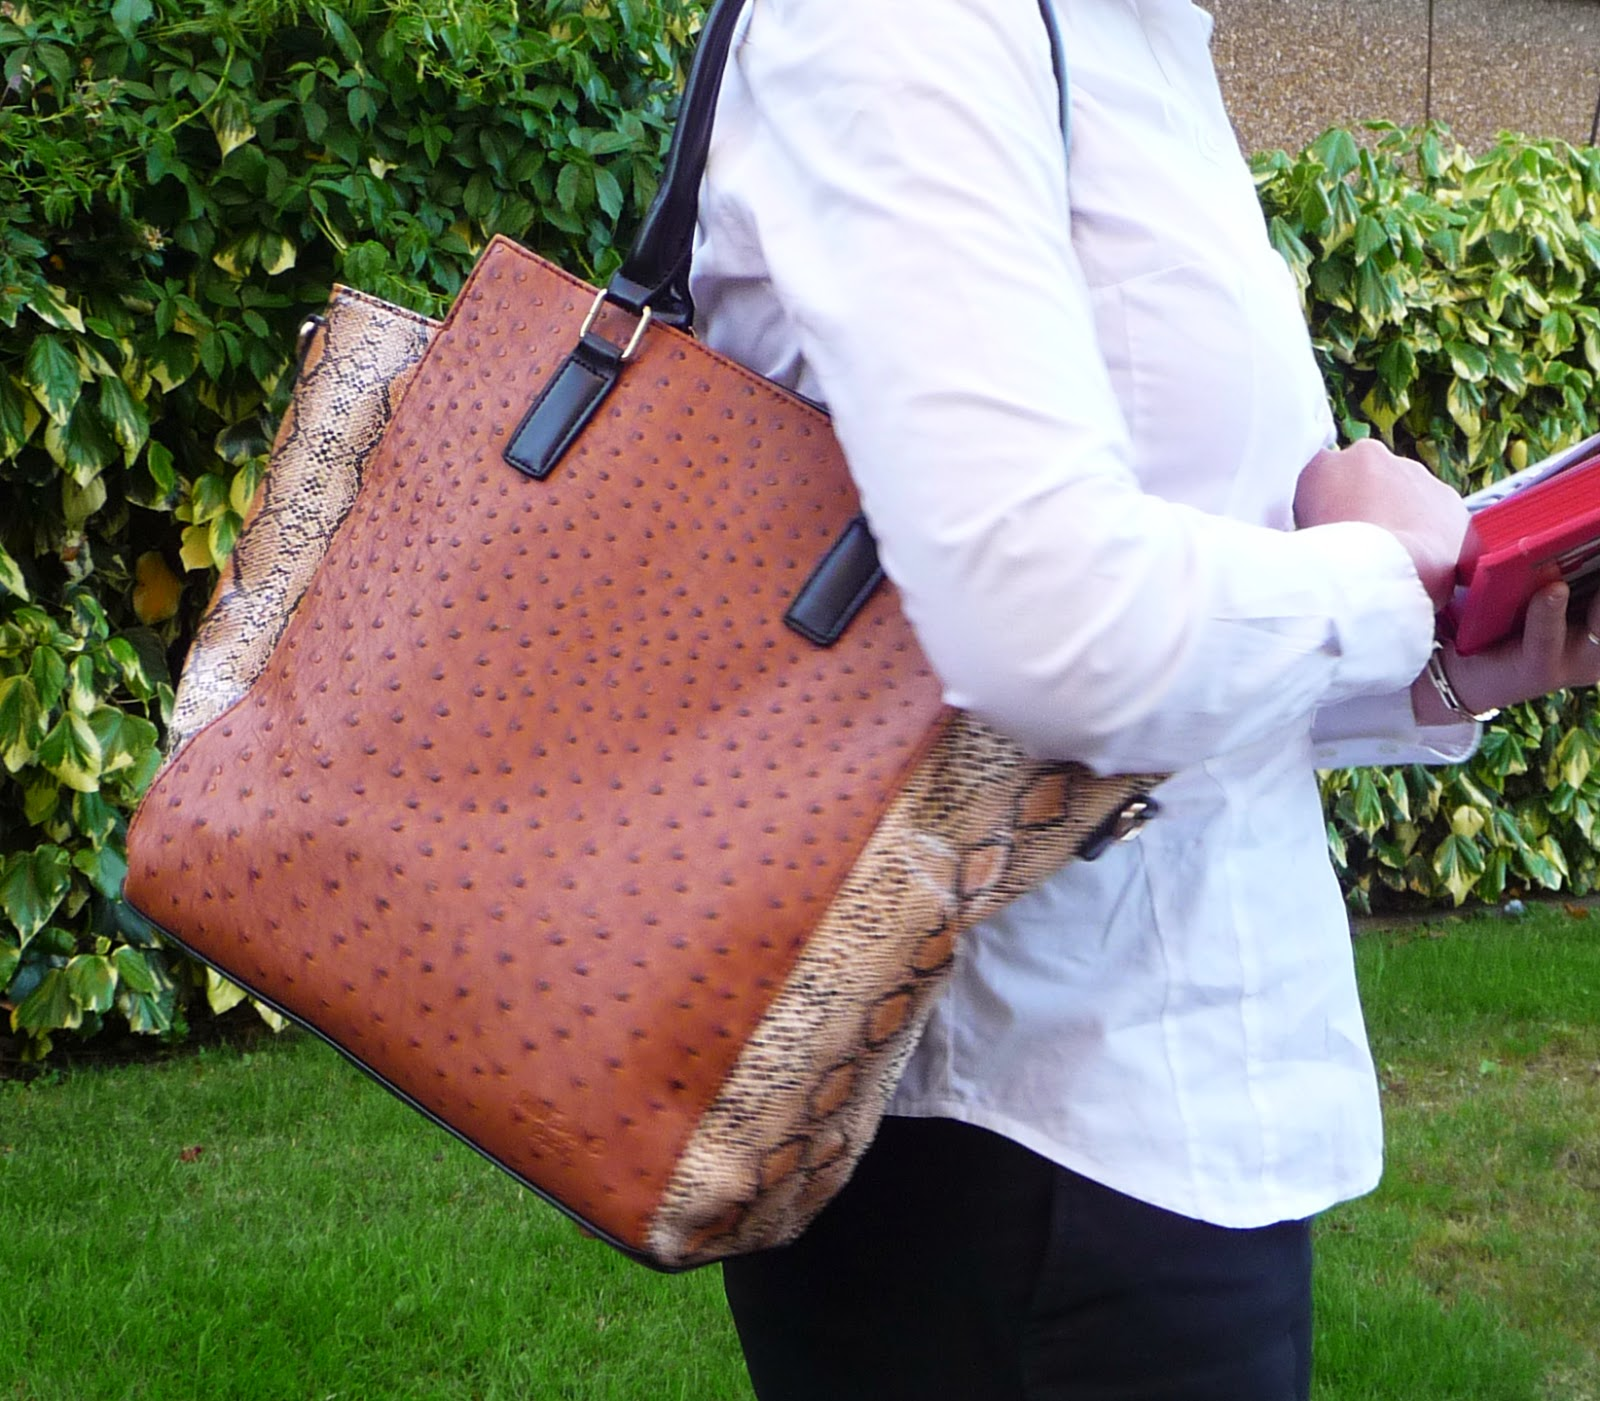 http://www.ebay.fr/itm/sac-a-main-feminin-facon-autruche-python-shopper-marron-femme-elegante-PAS-CHER-/301206431390?ssPageName=STRK:MESE:IT